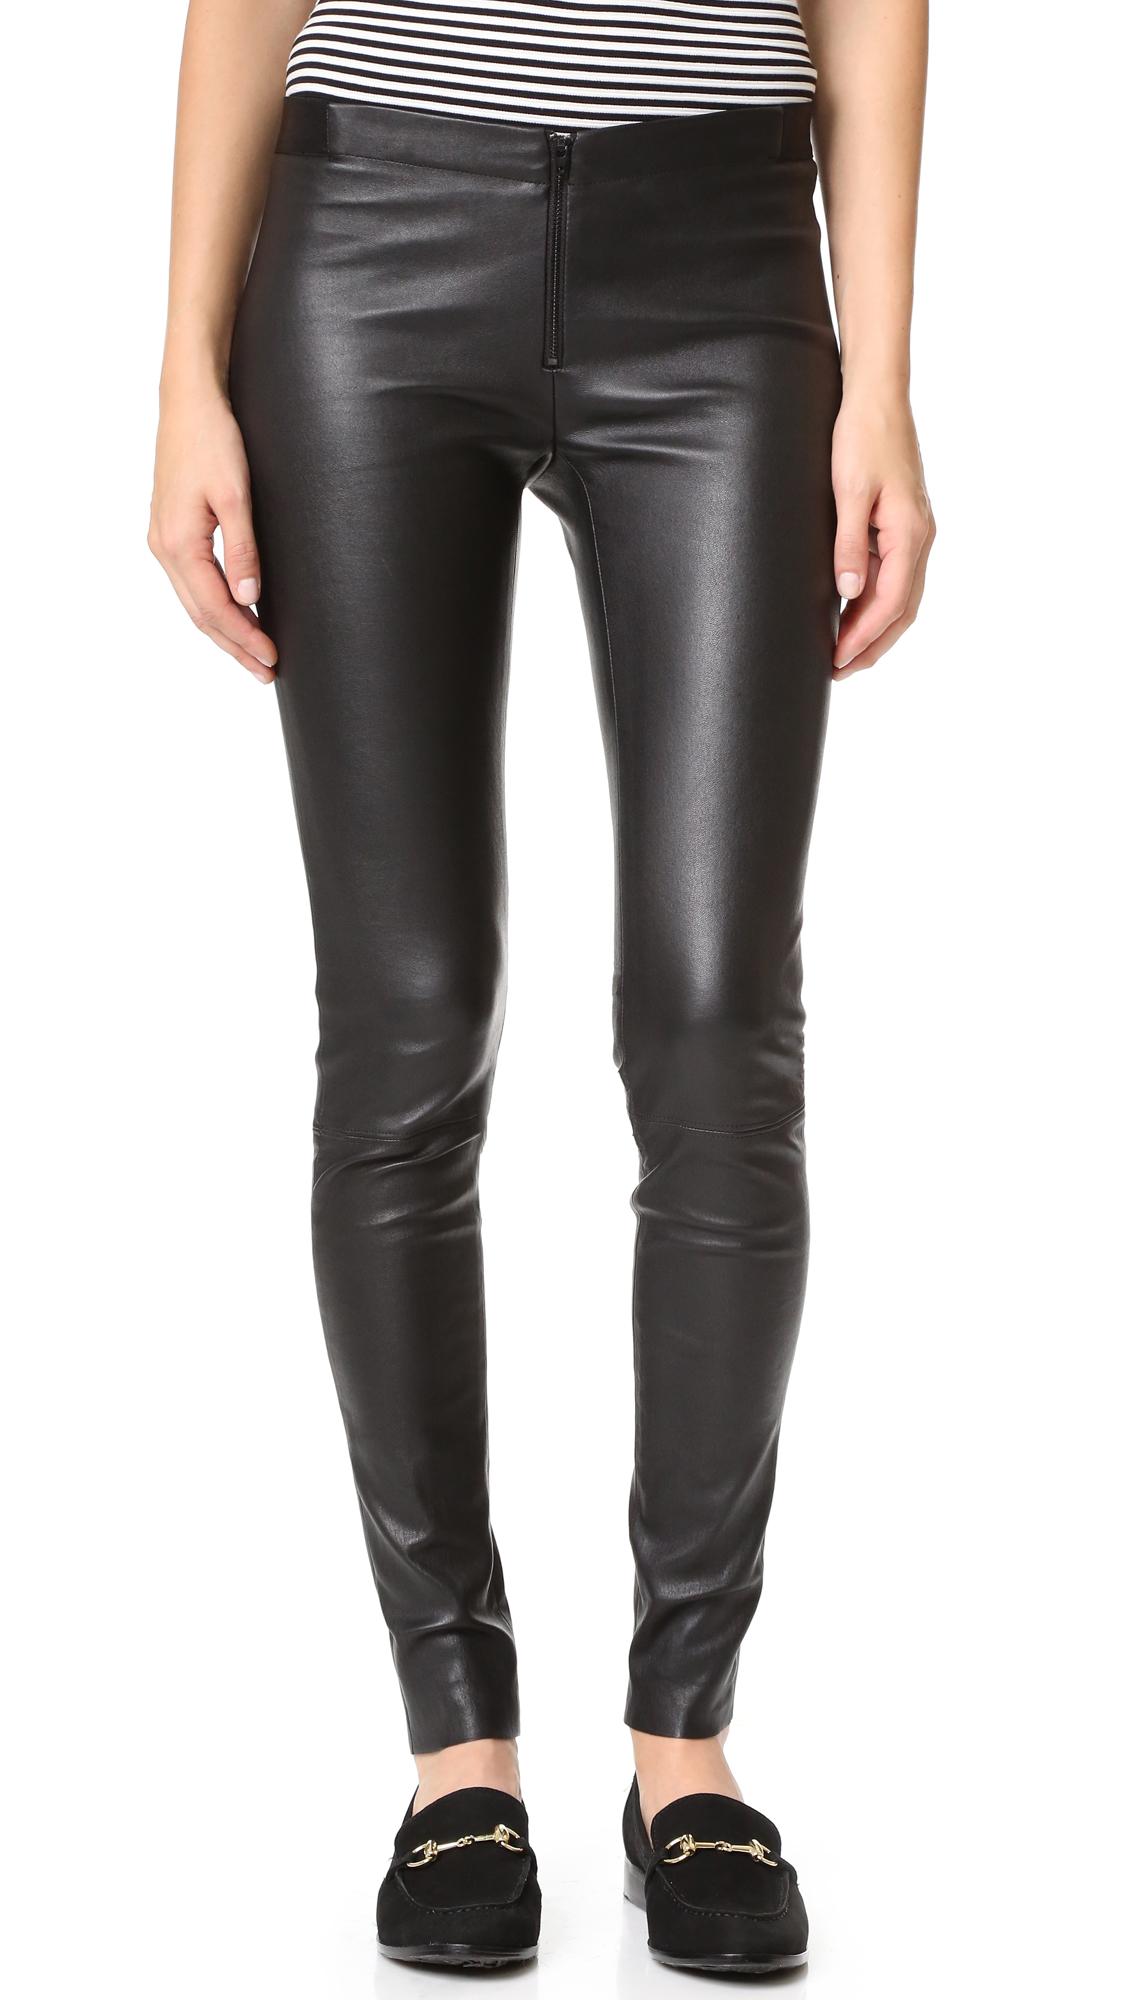 Alice + Olivia Zip Front Leather Leggings - Black at Shopbop